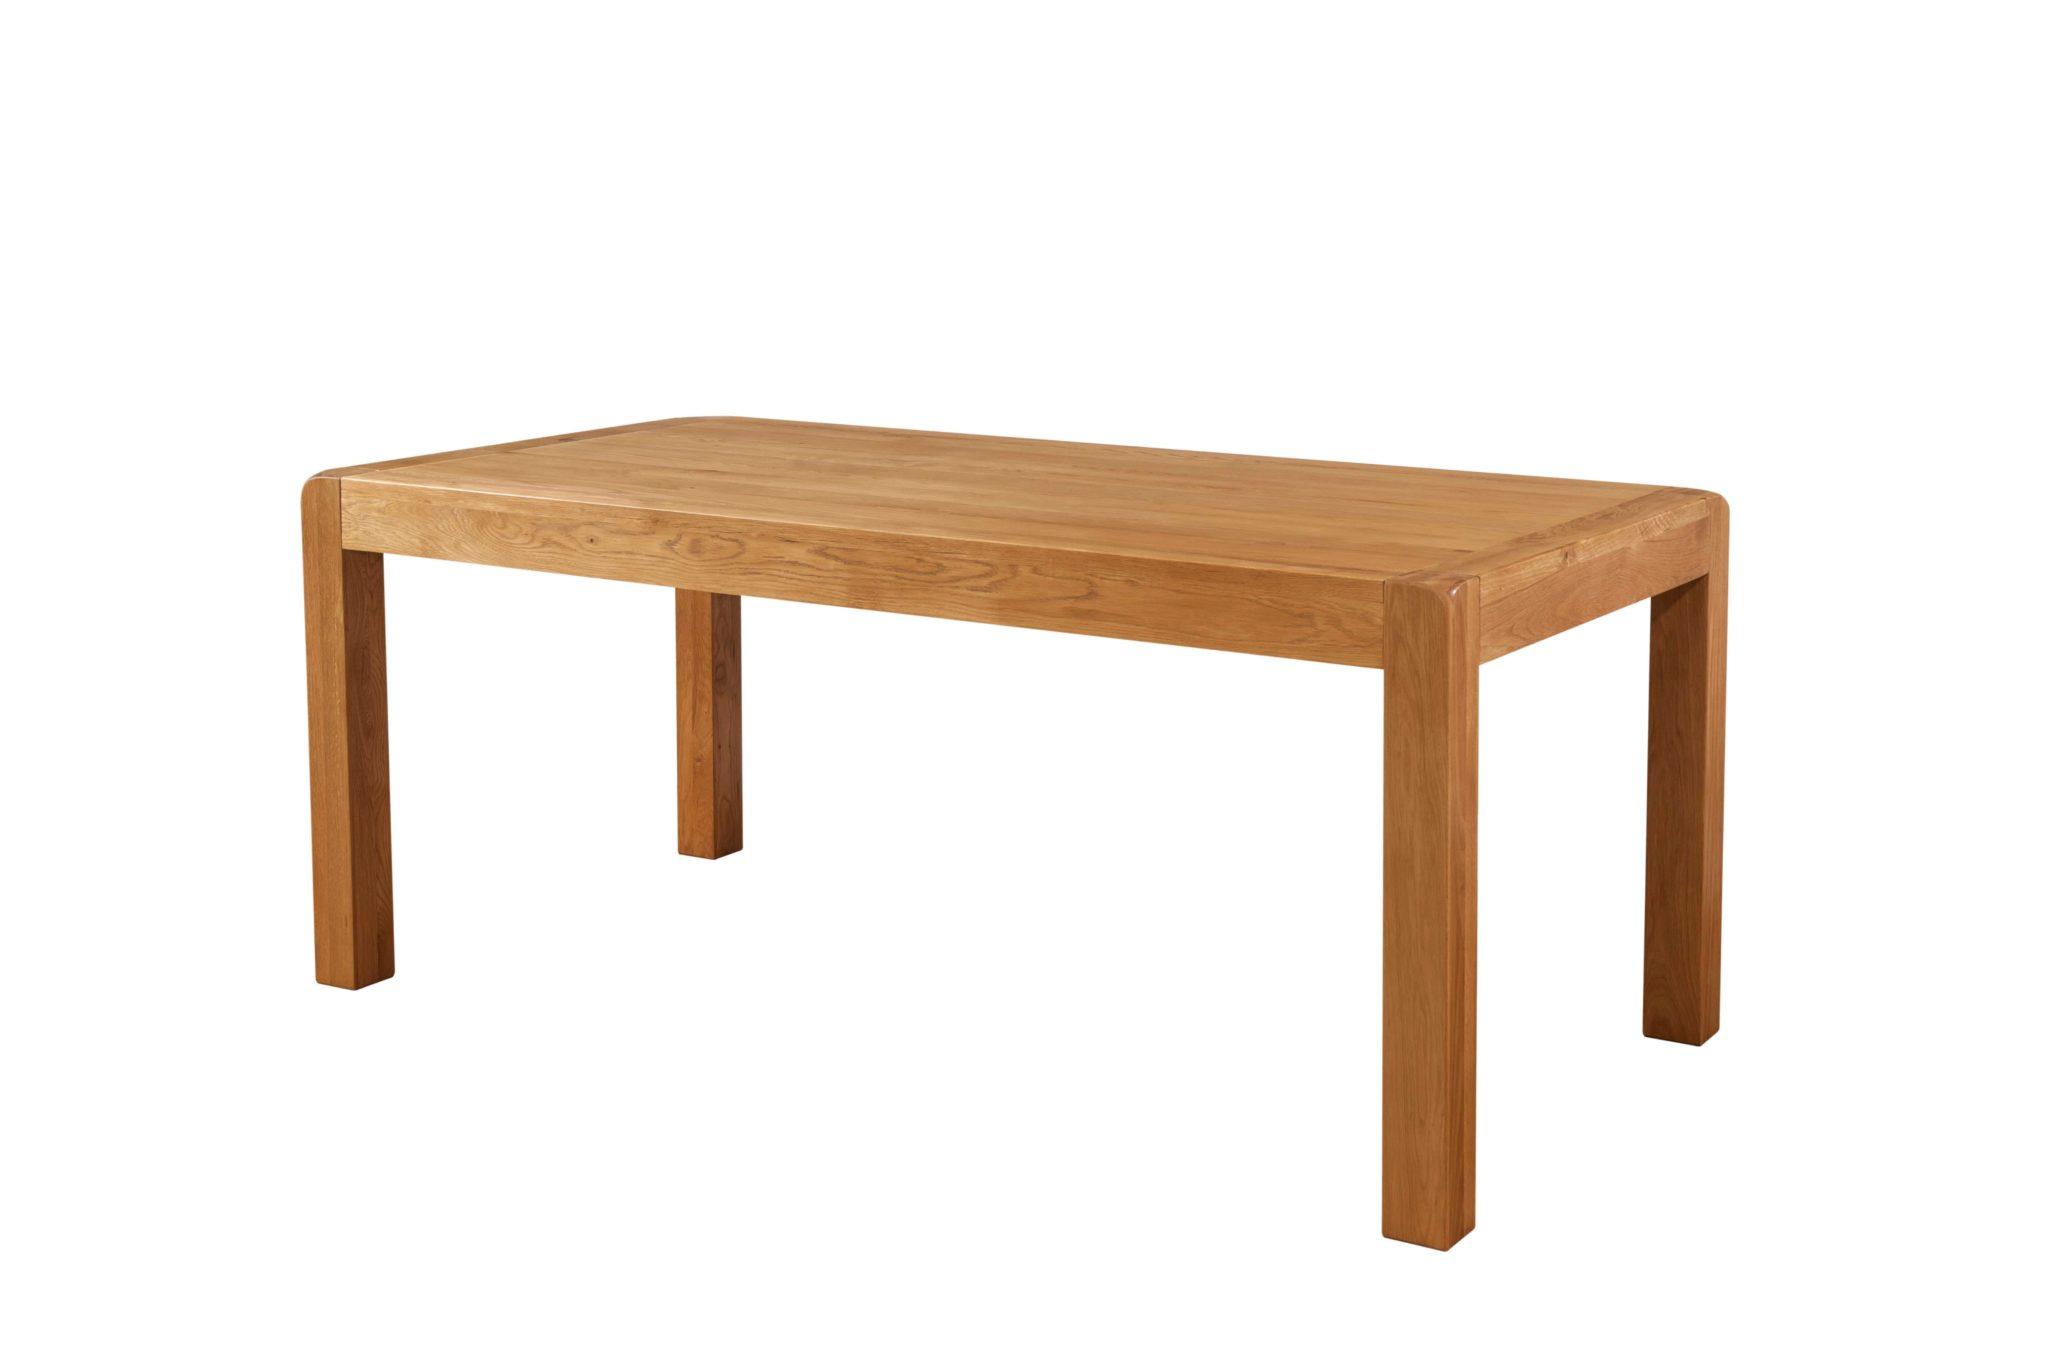 DAV024 Avon Oak. 180cm Dining Table. medium waxed oak finish with rounded edges. non extending